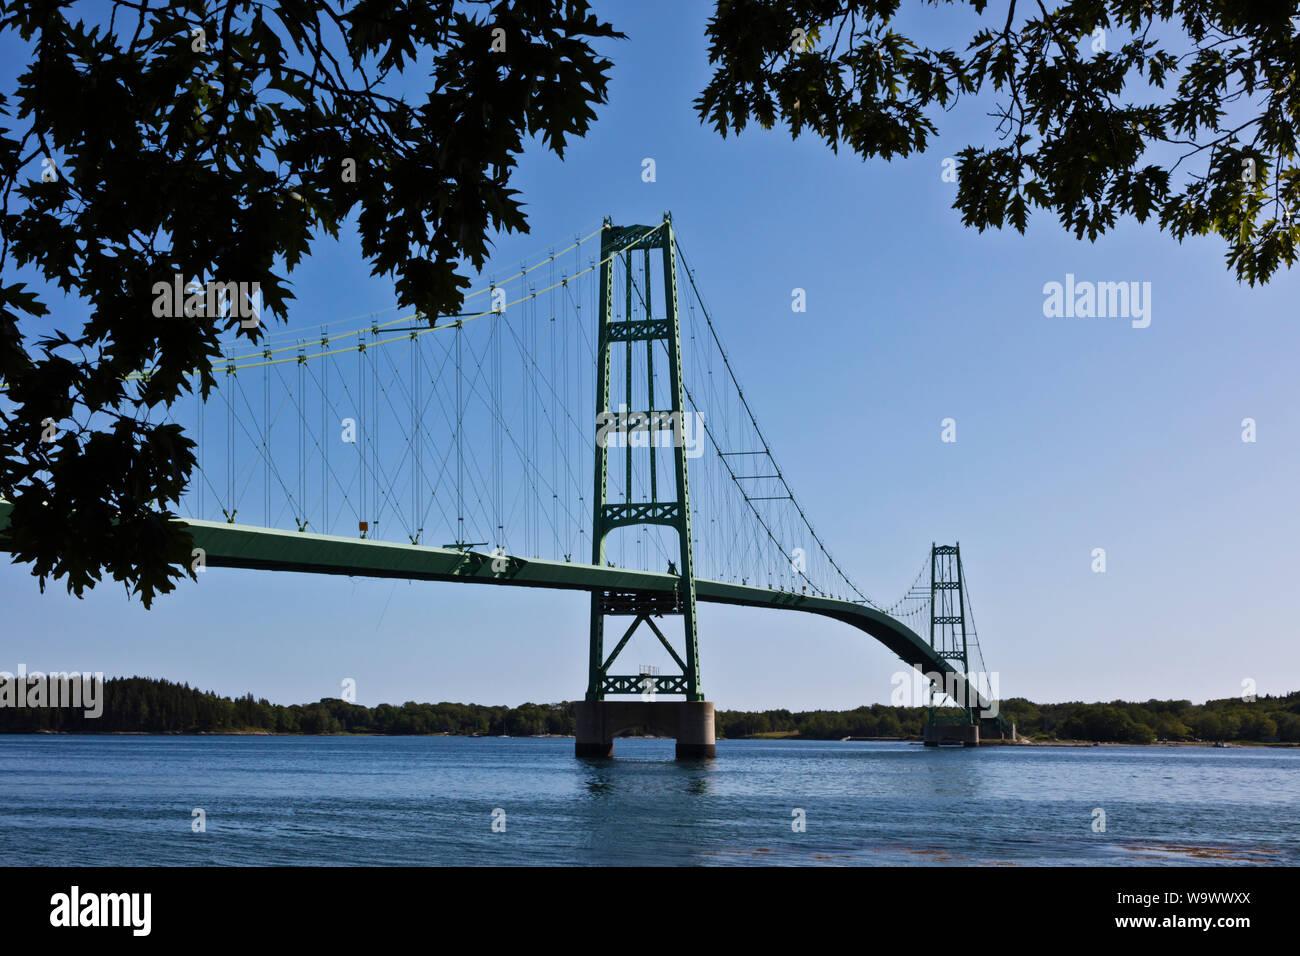 DEER ISLAND puente conecta la isla con tierra firme - Deer Island, Maine Foto de stock